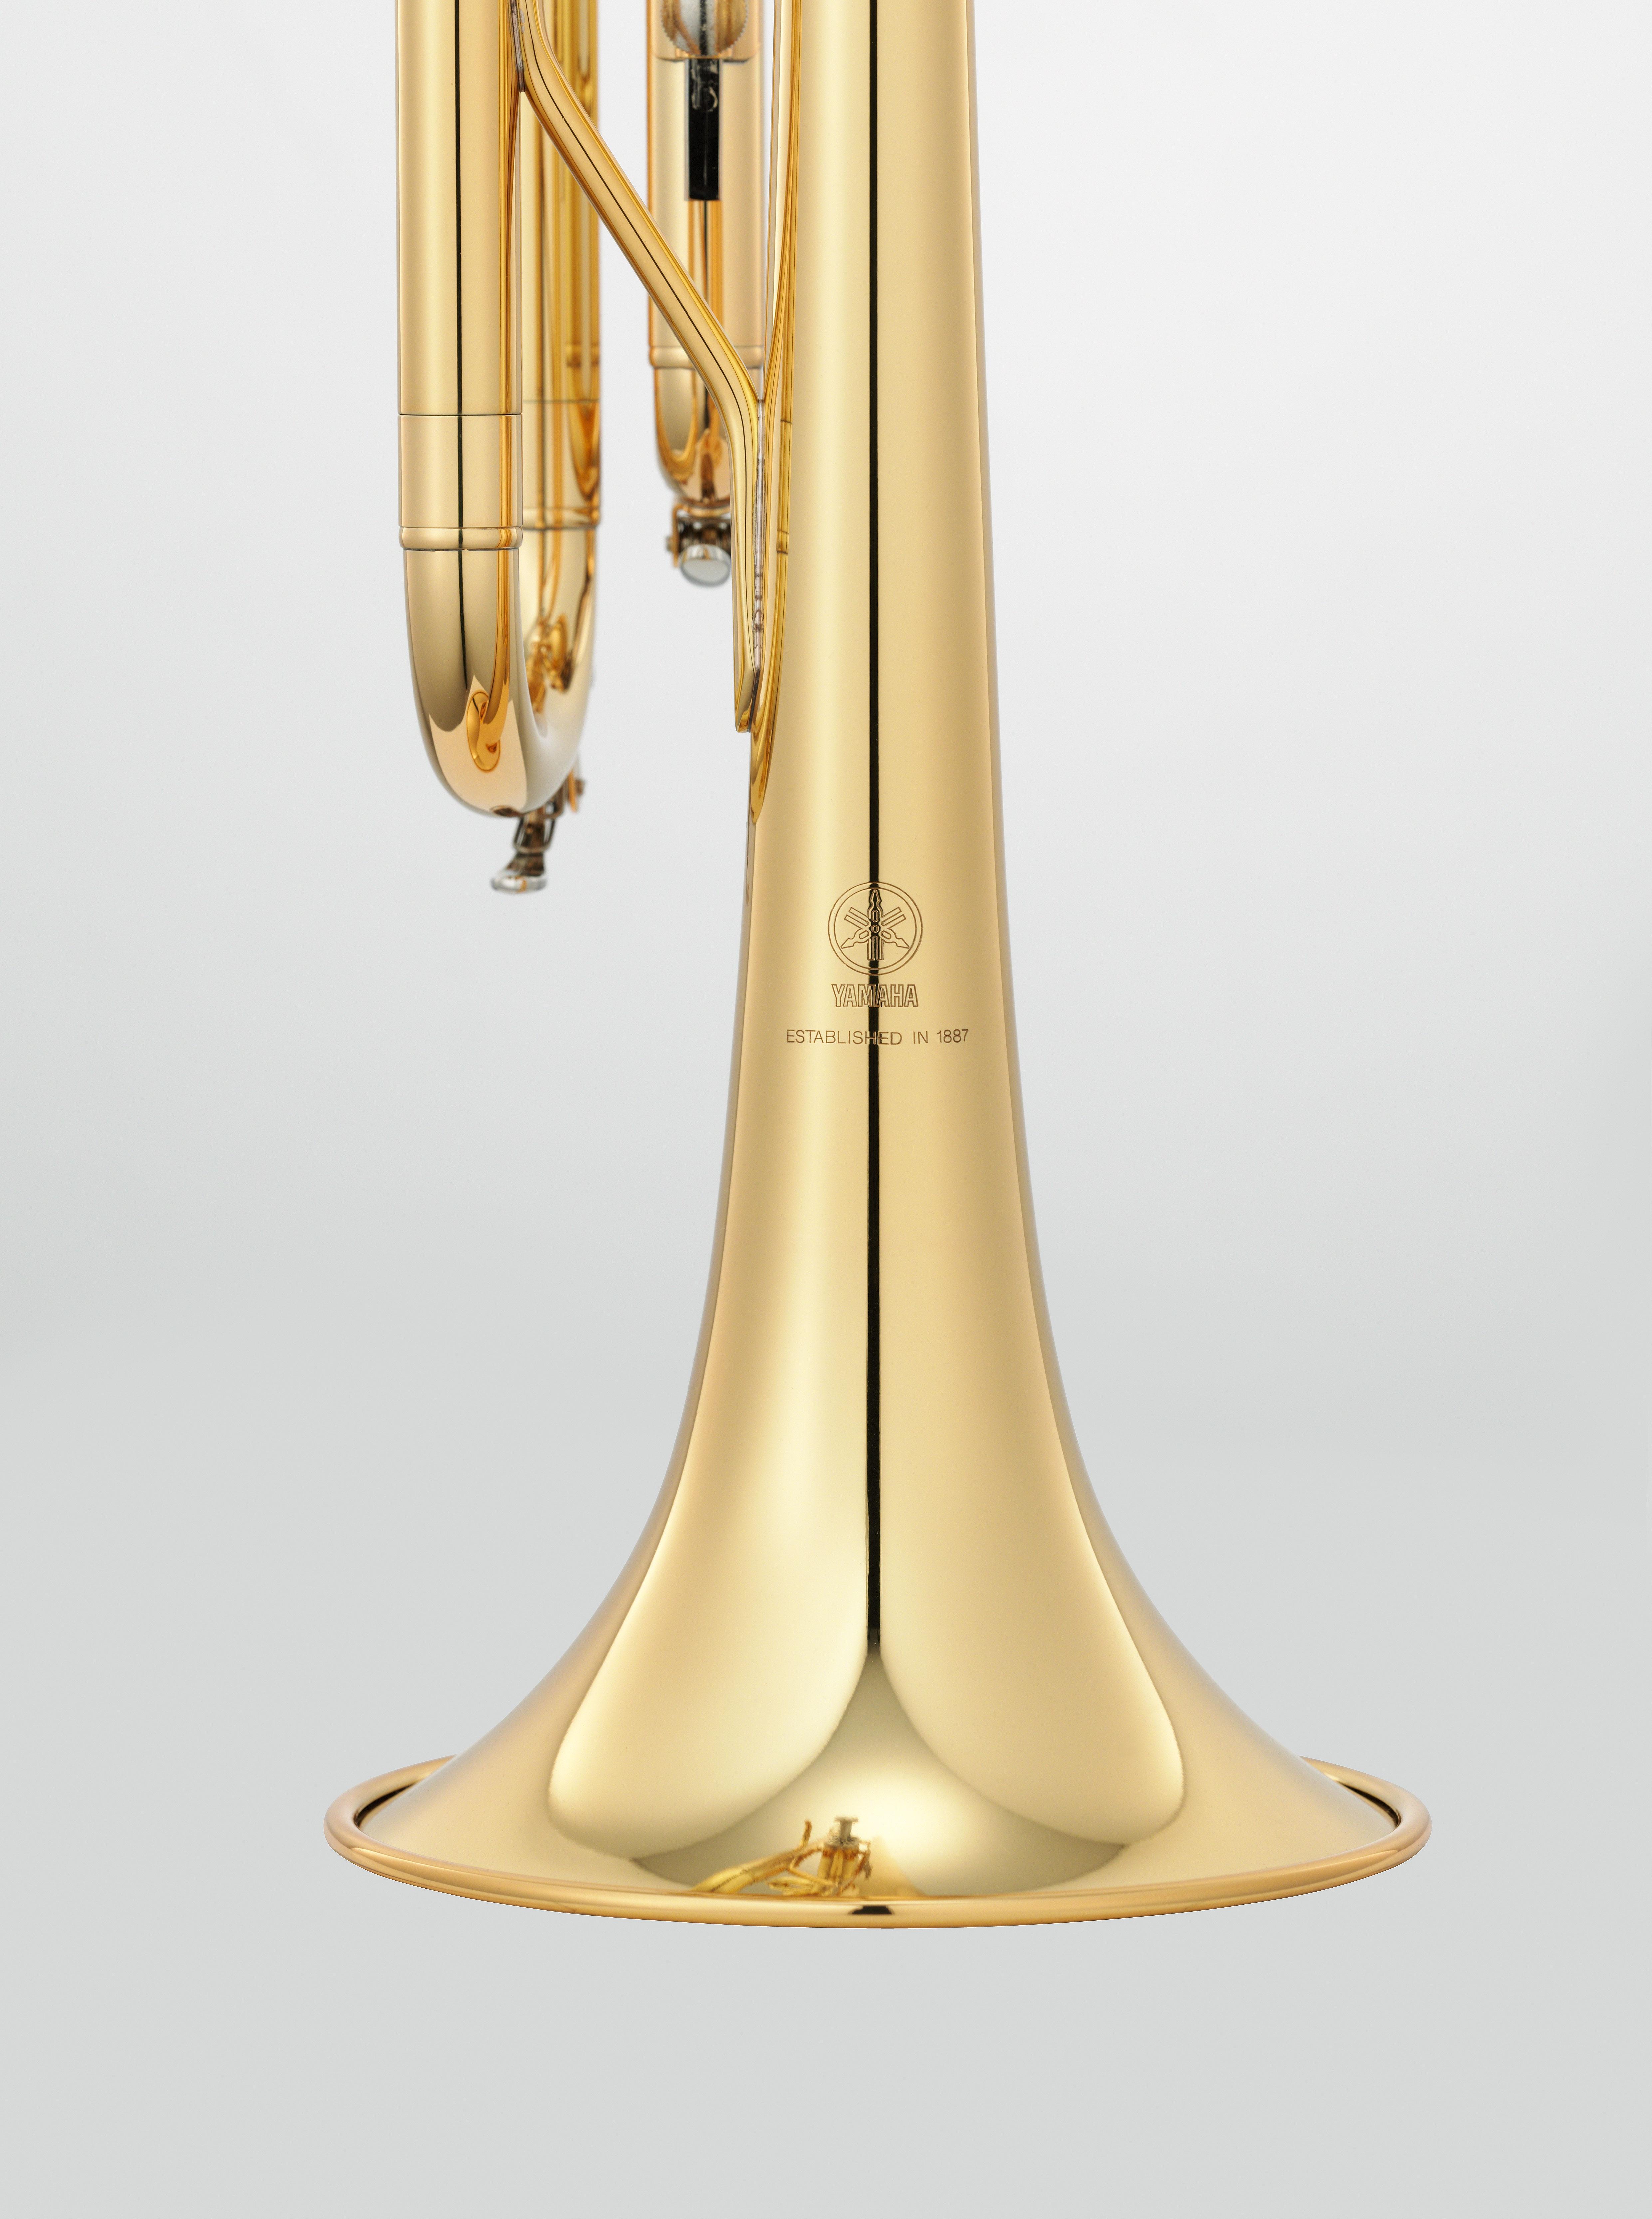 bb trompete yamaha ytr 2330 musikhaus g ckes neu isenburg. Black Bedroom Furniture Sets. Home Design Ideas